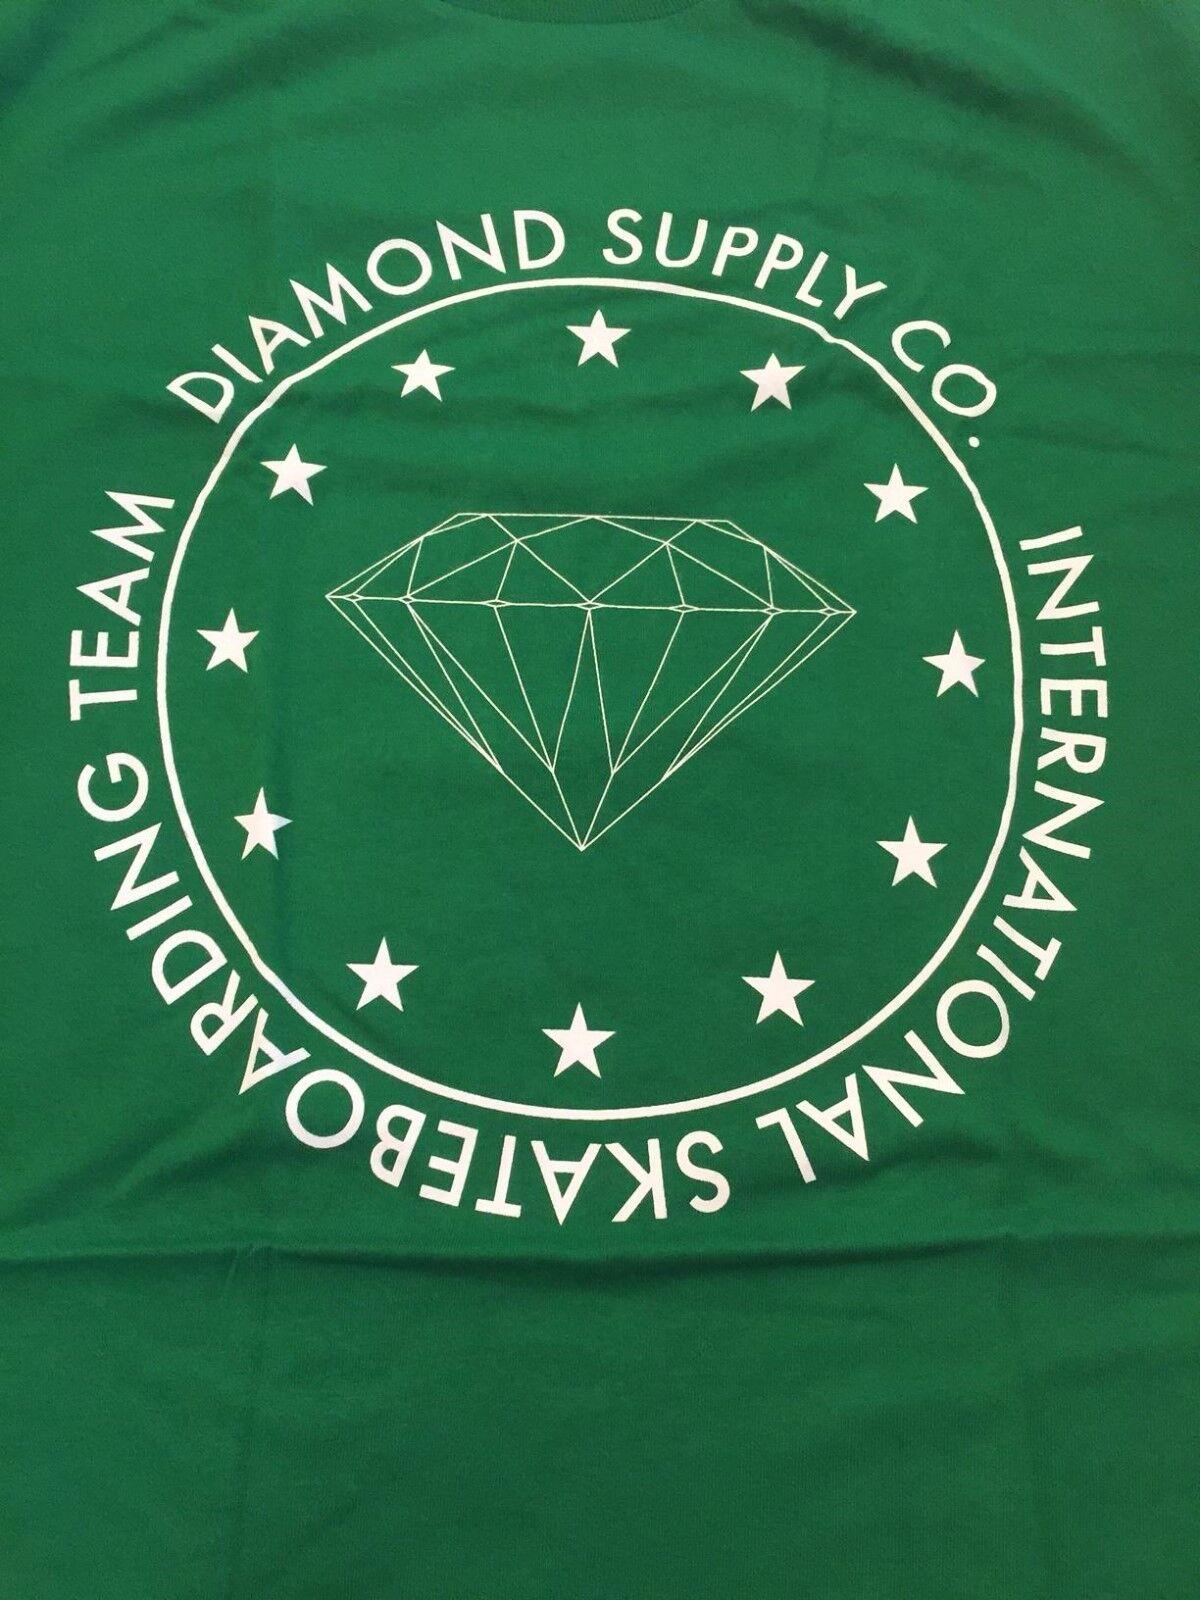 Diamond Supply Co. International Team Tee s/s Kelly Grün Large RARE 2008